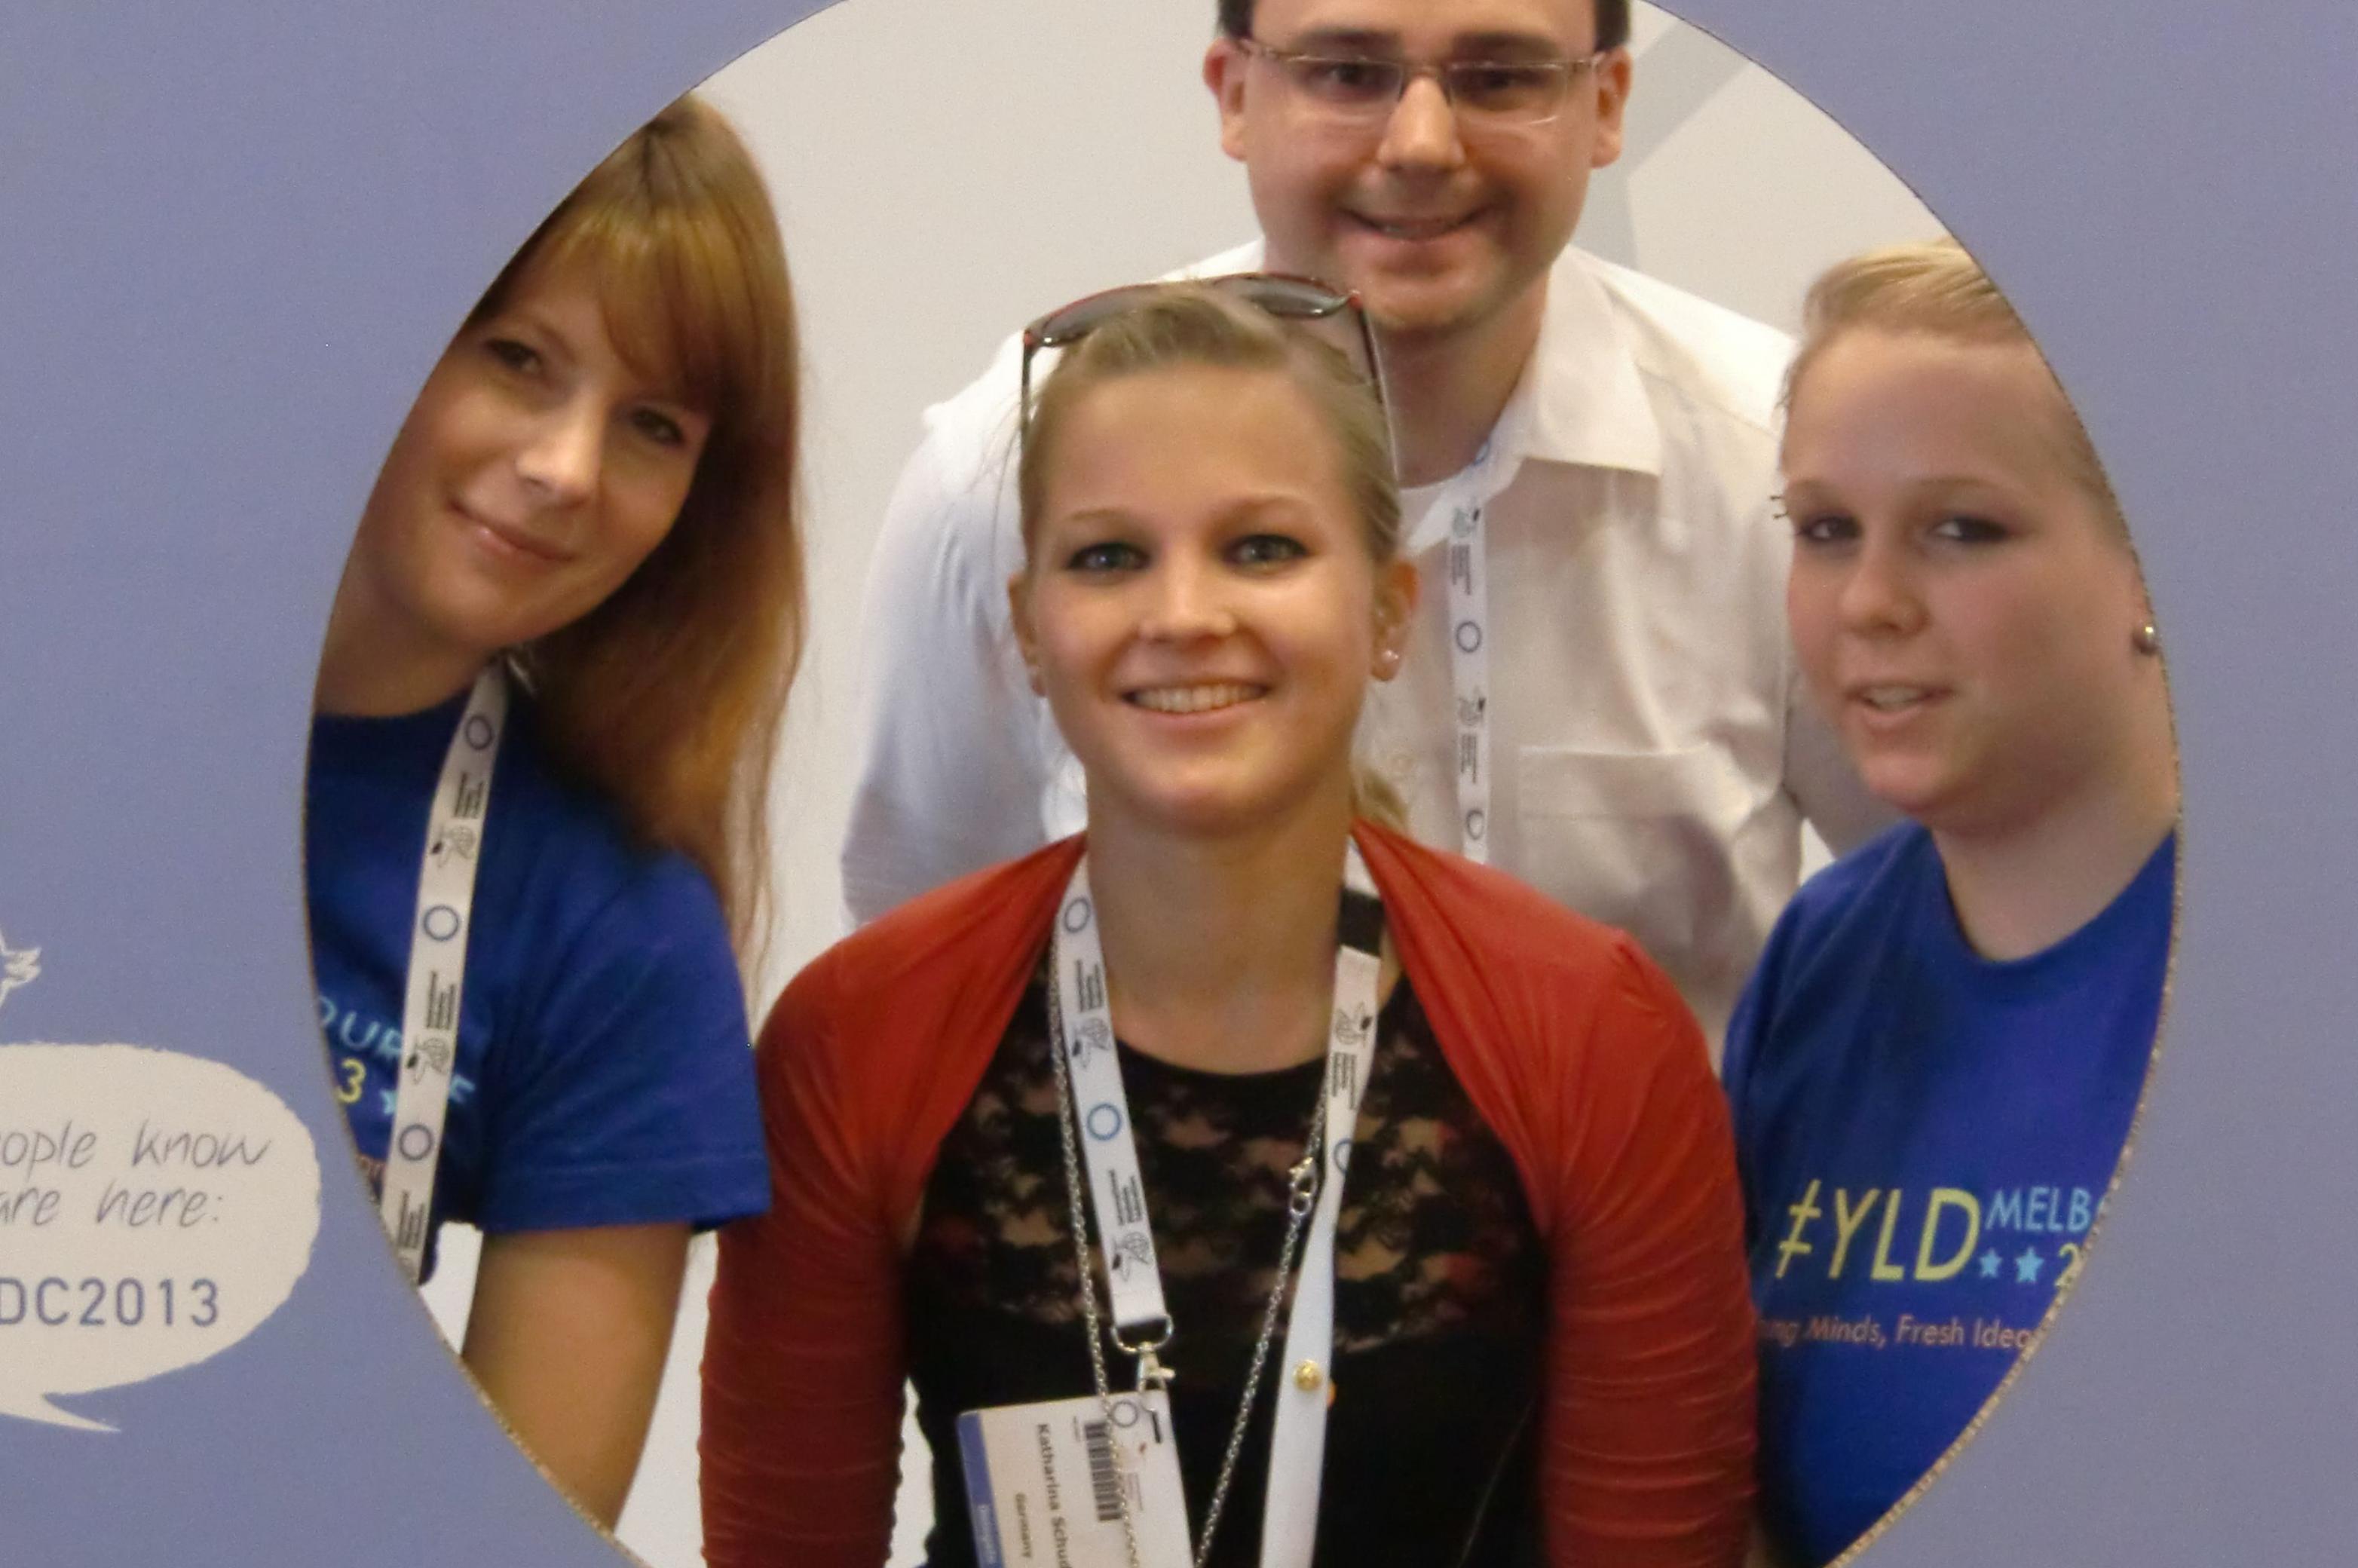 Weltdiabeteskongress 2013 Young Leaders